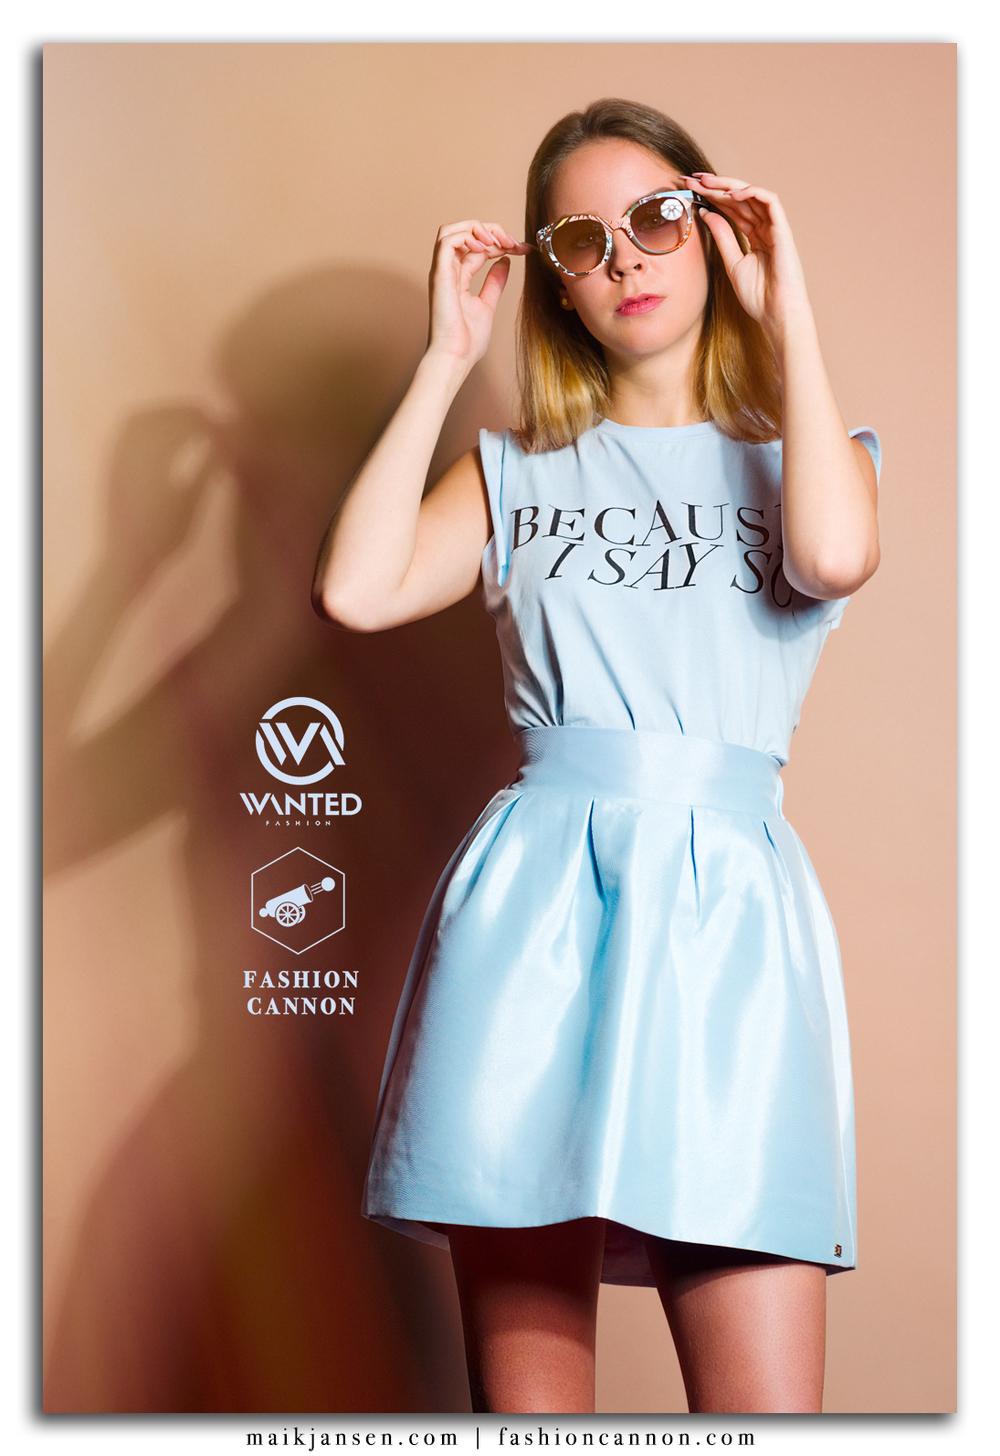 Model: Ilaya Zomerschoe Styling: Kiki Starrenburg Boetiek: Wanted Fashion Zonnebril: Van Tiem Optiek Fashion label: JoshV